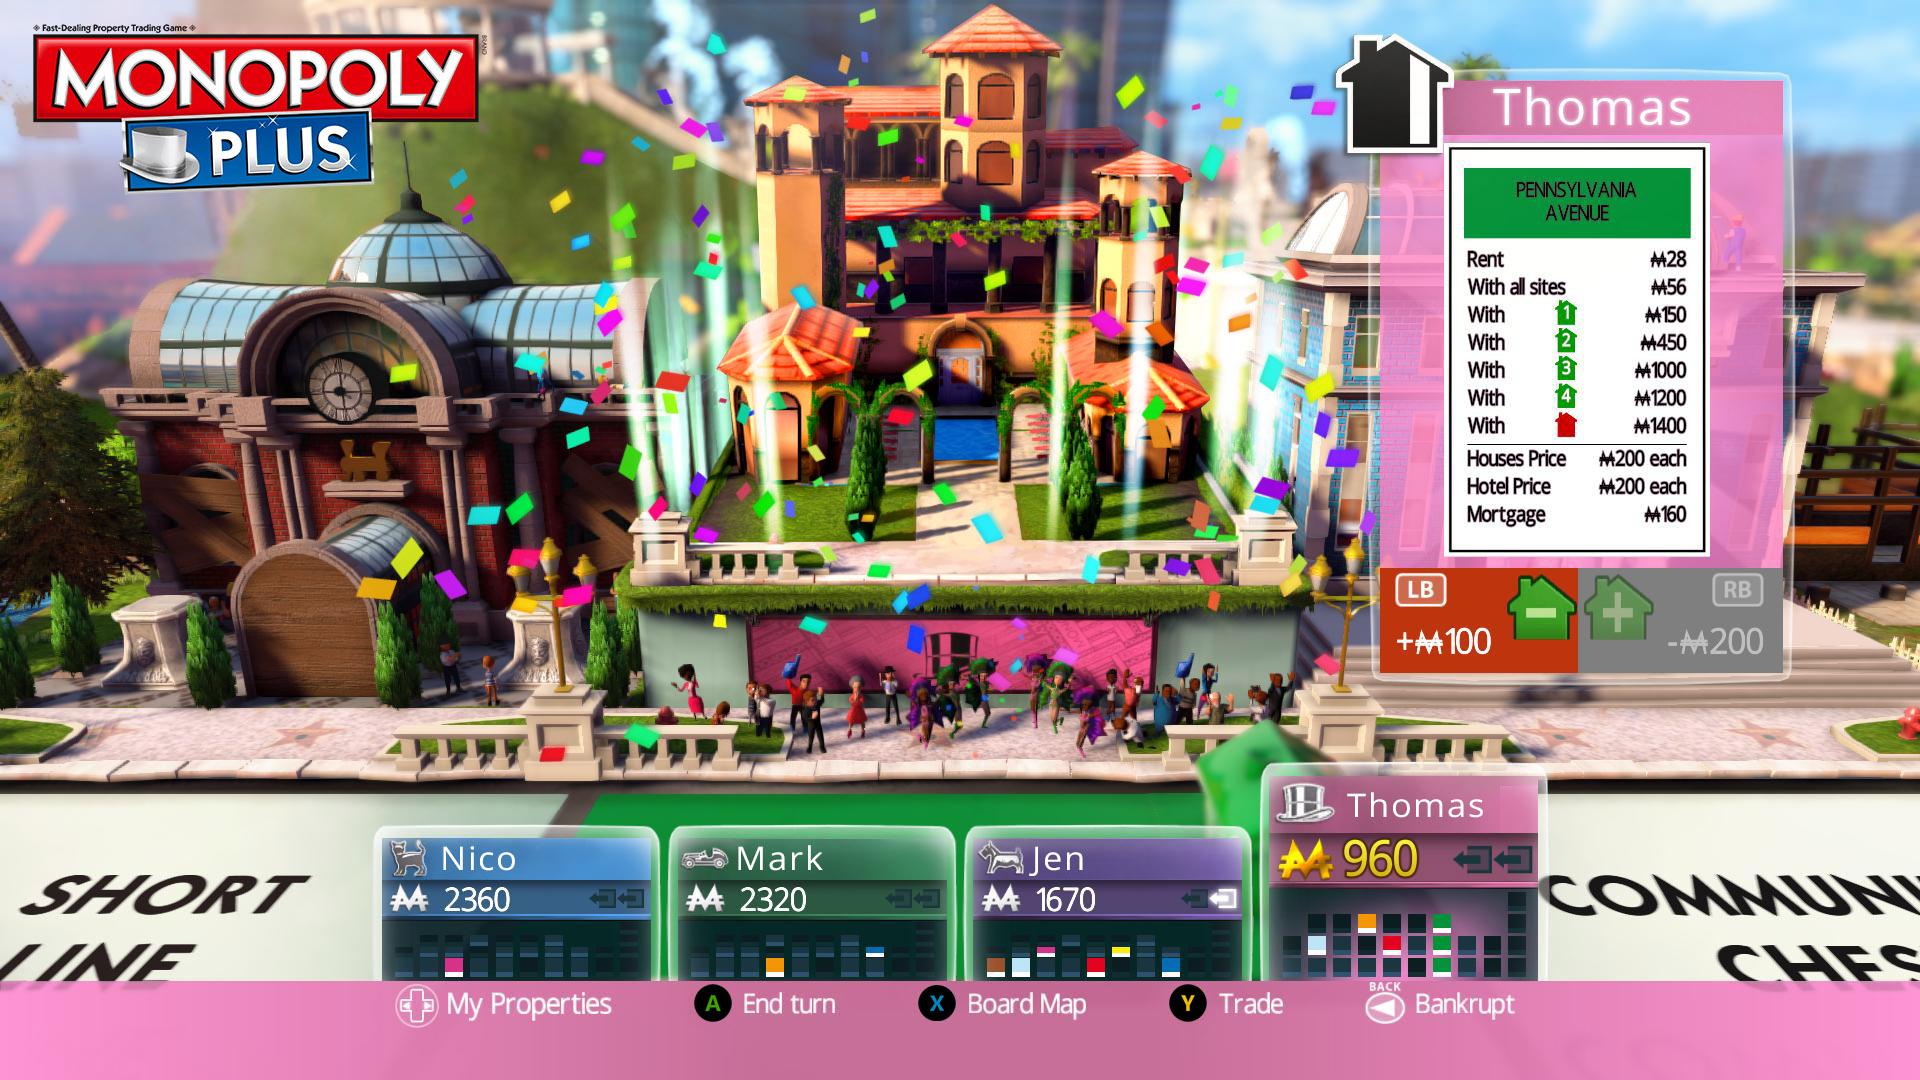 HBG Monopoly Plus Screens 01